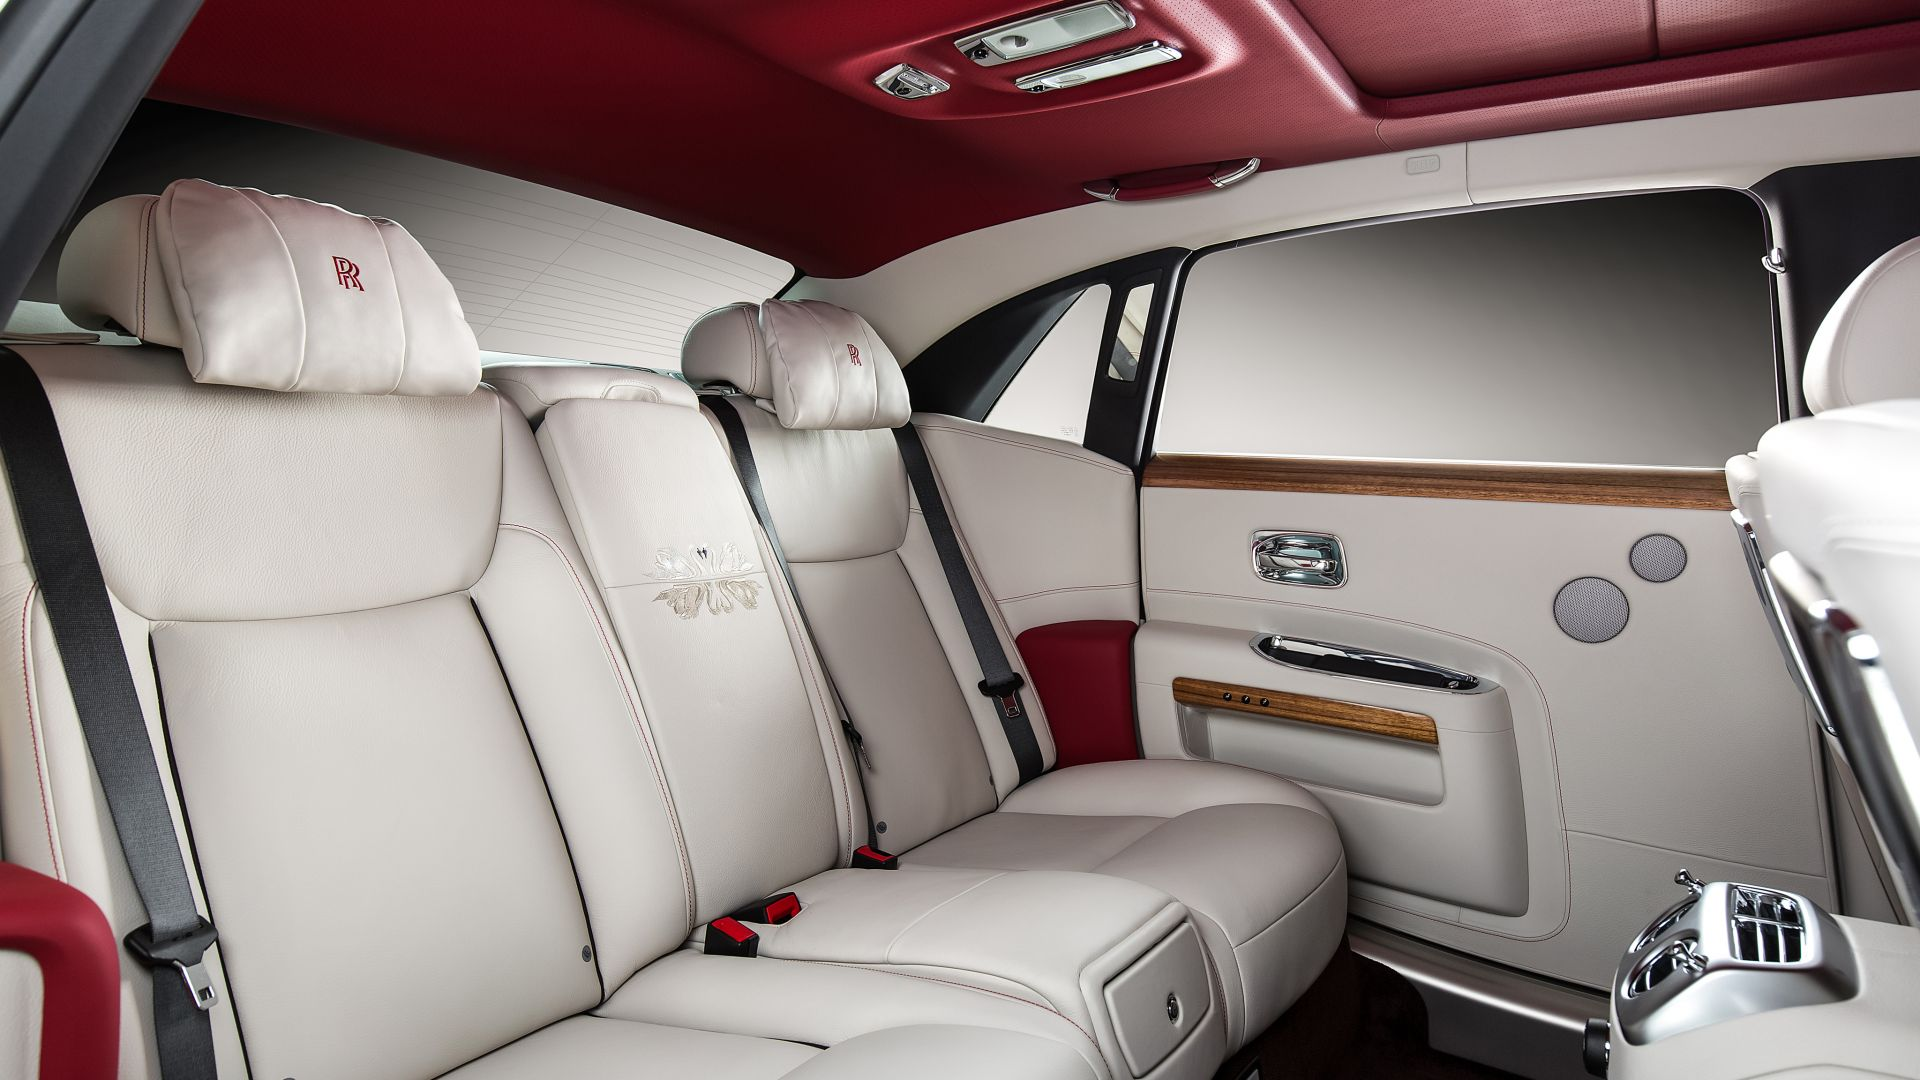 royce rolls interior ghost luxury eternal cars china seats rear bikes inside debuts seat 4k brand topspeed wallpapershome four